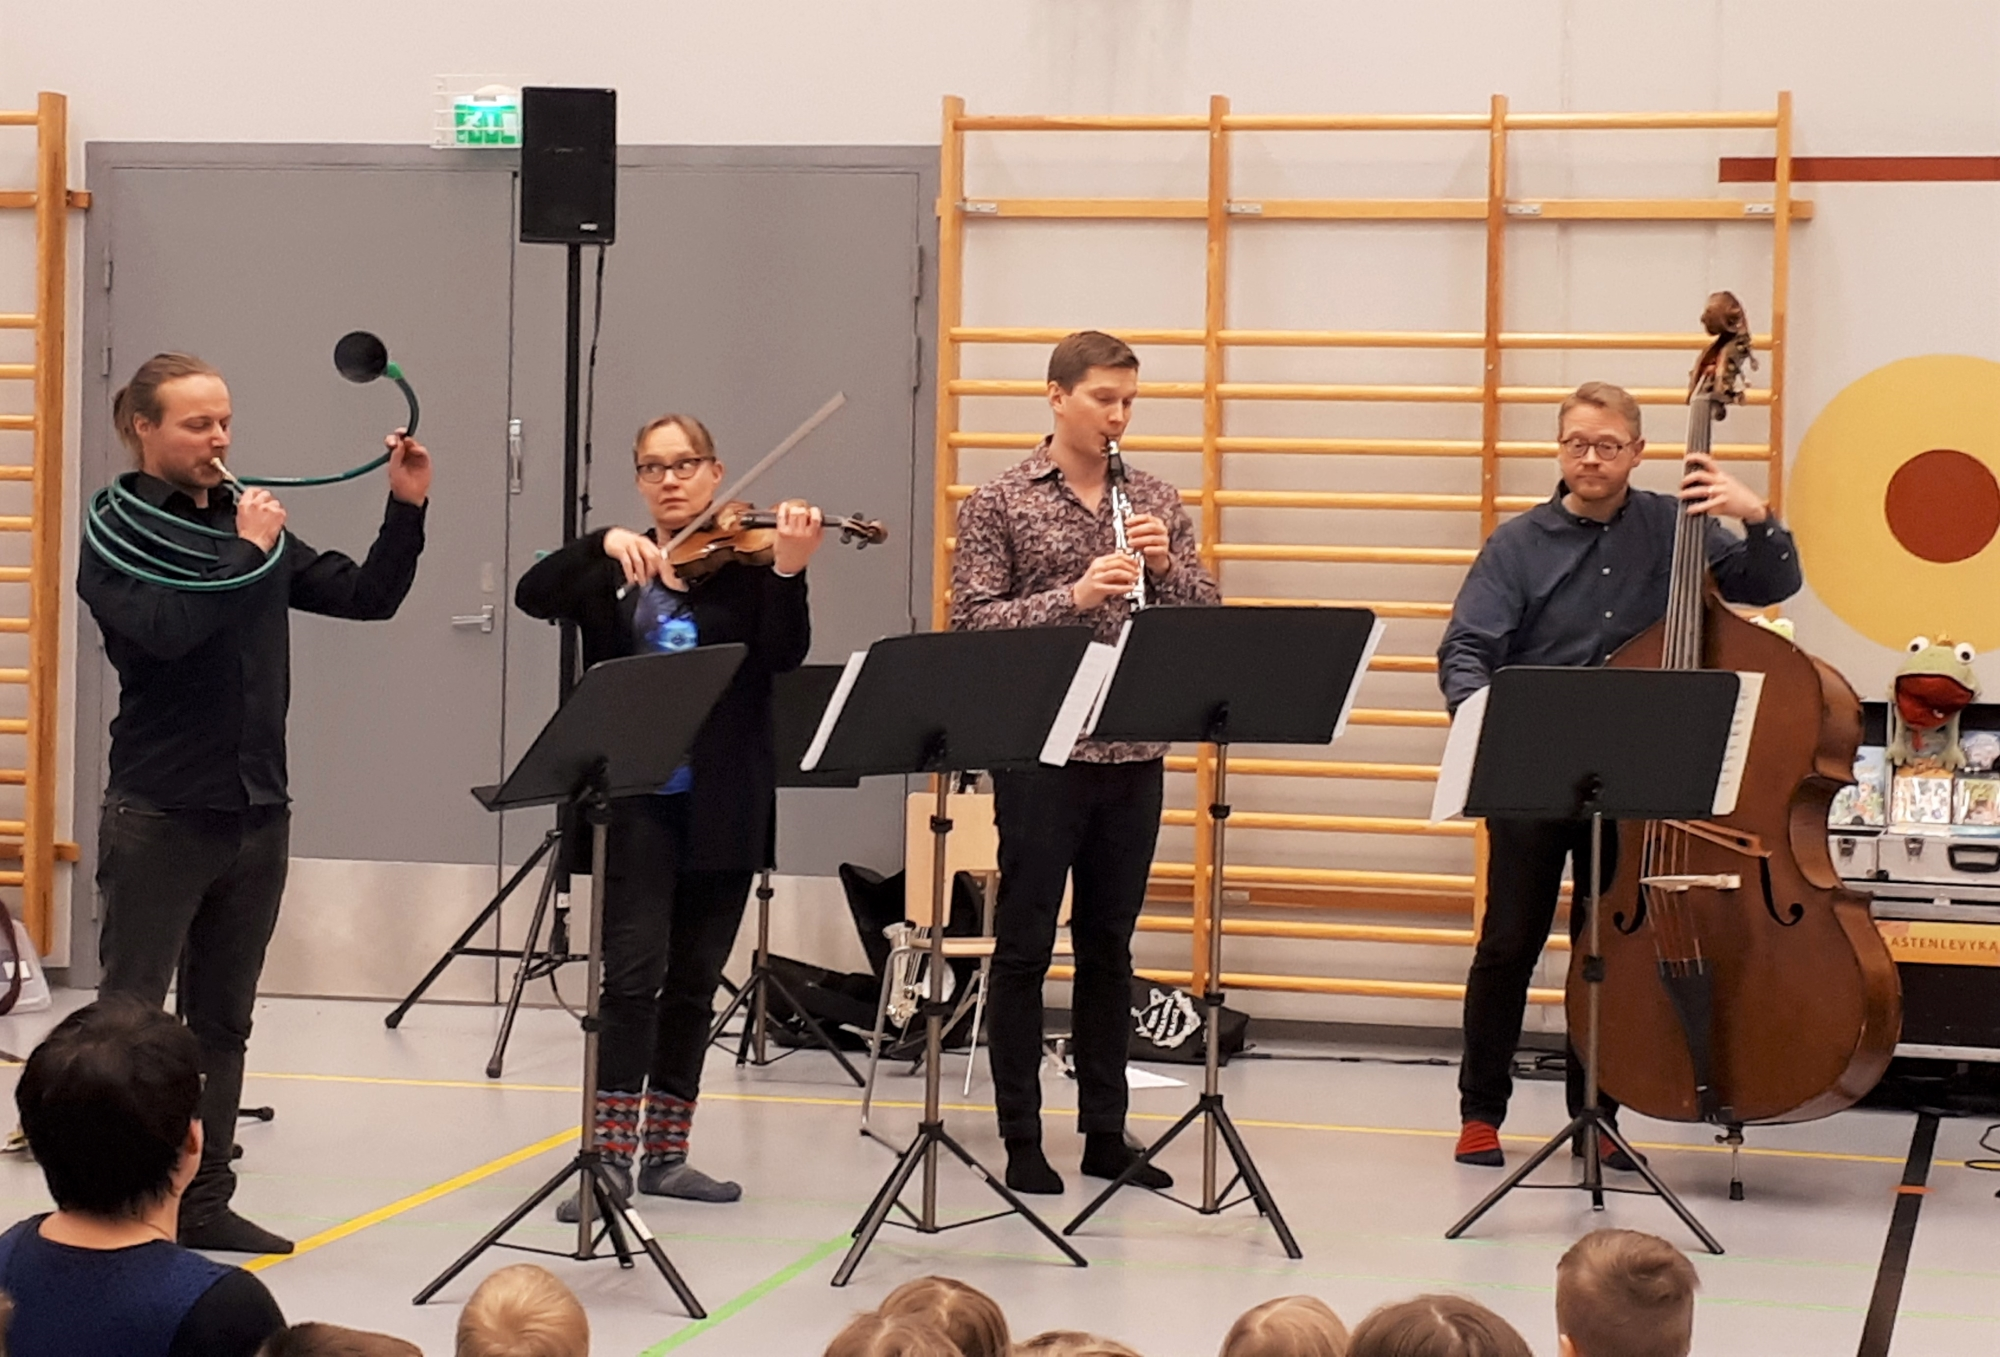 sinf_koronavinkki_orkesterikylassa2.jpg